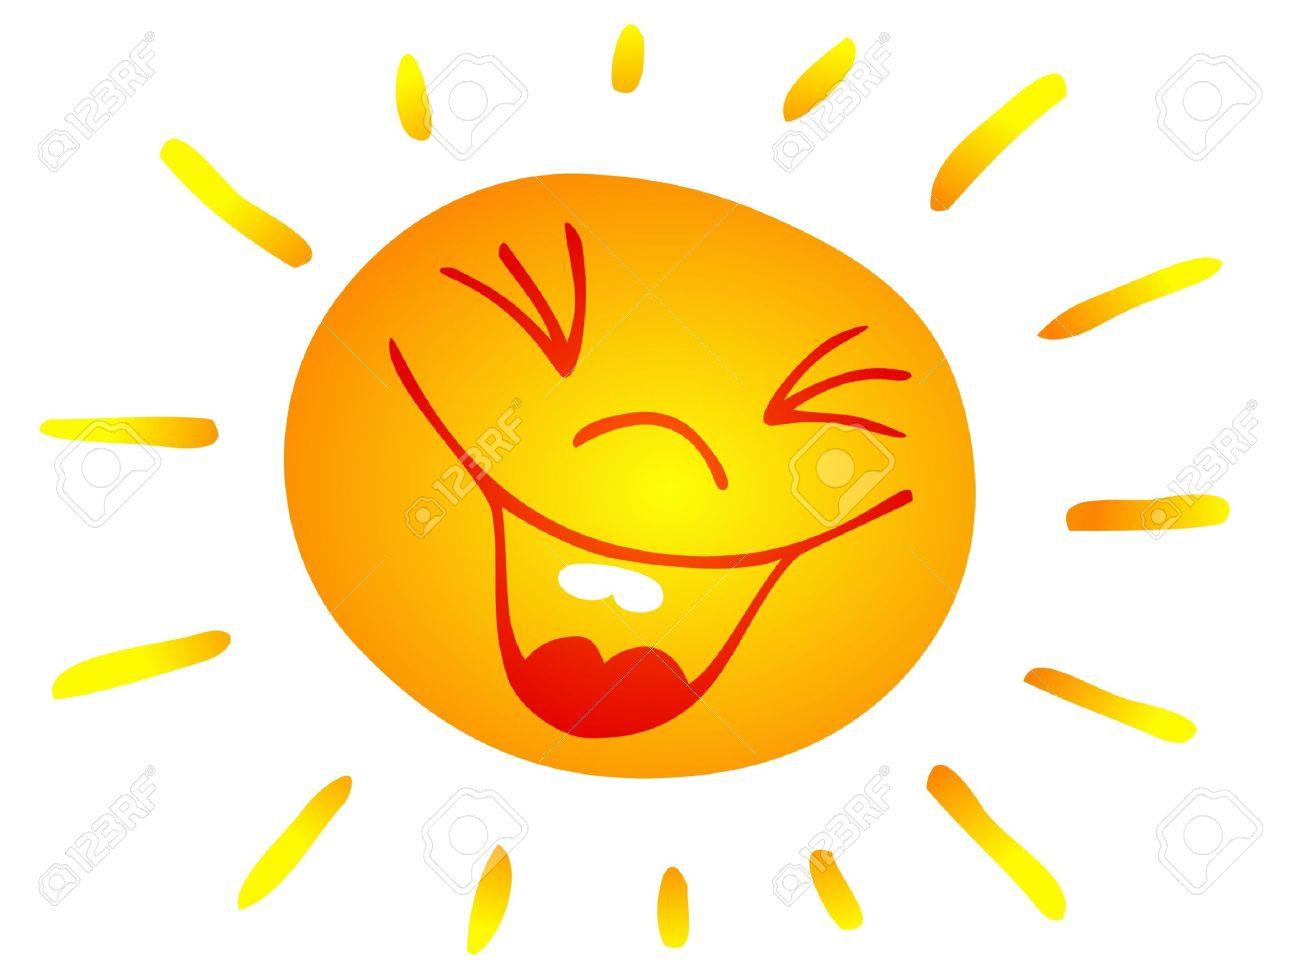 Smiling Sun Clip Art.